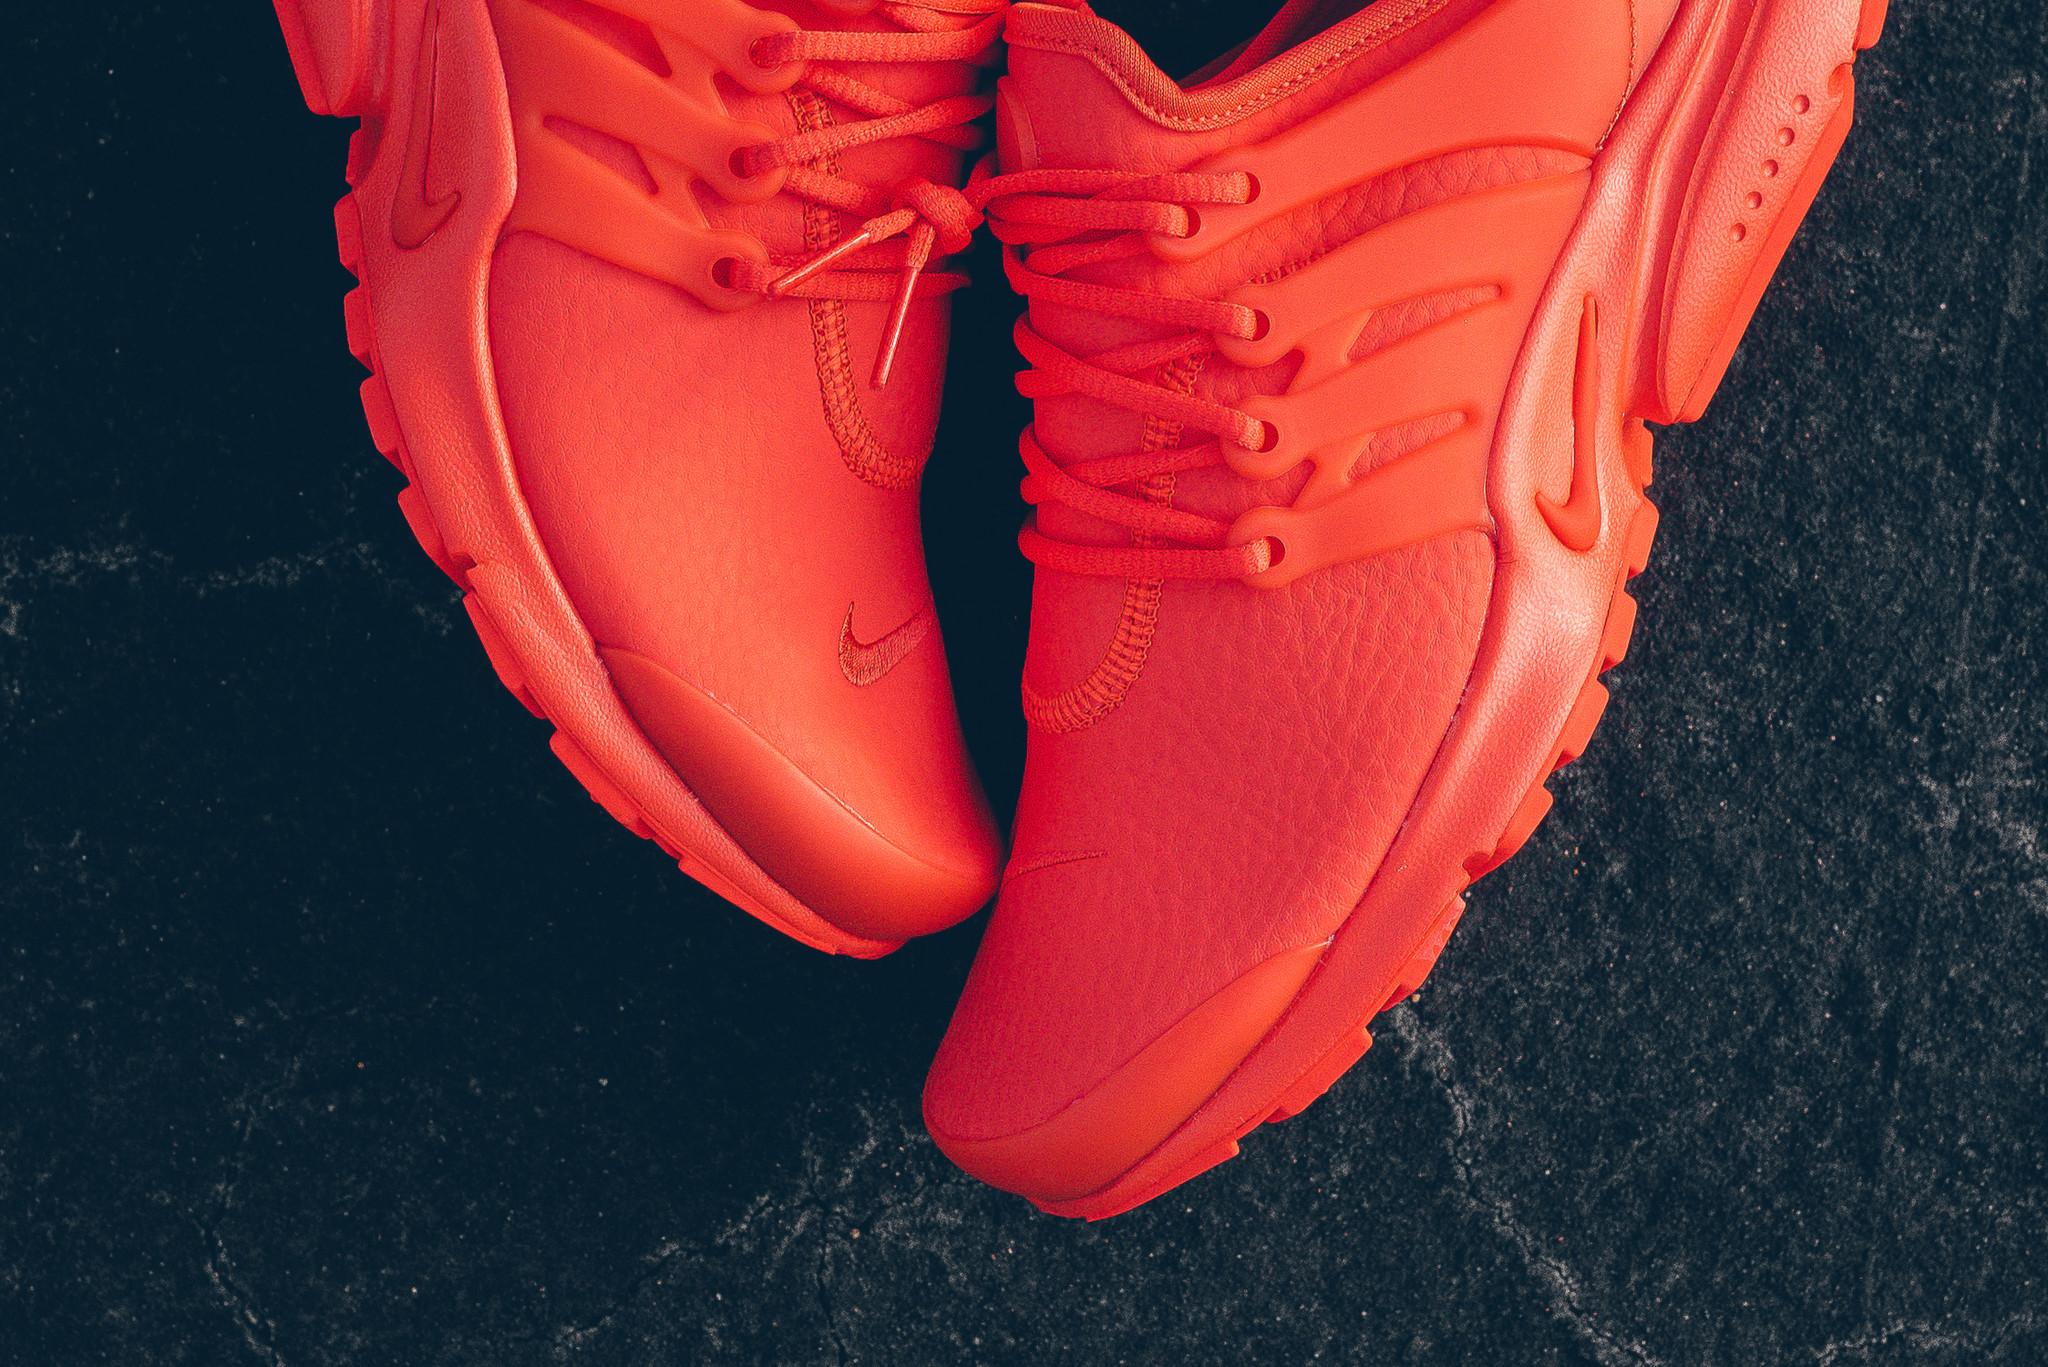 WMNS_Nike_Air_Presto_PRM_Max_Orange_Sneaker_Politics_HypeBeast_4